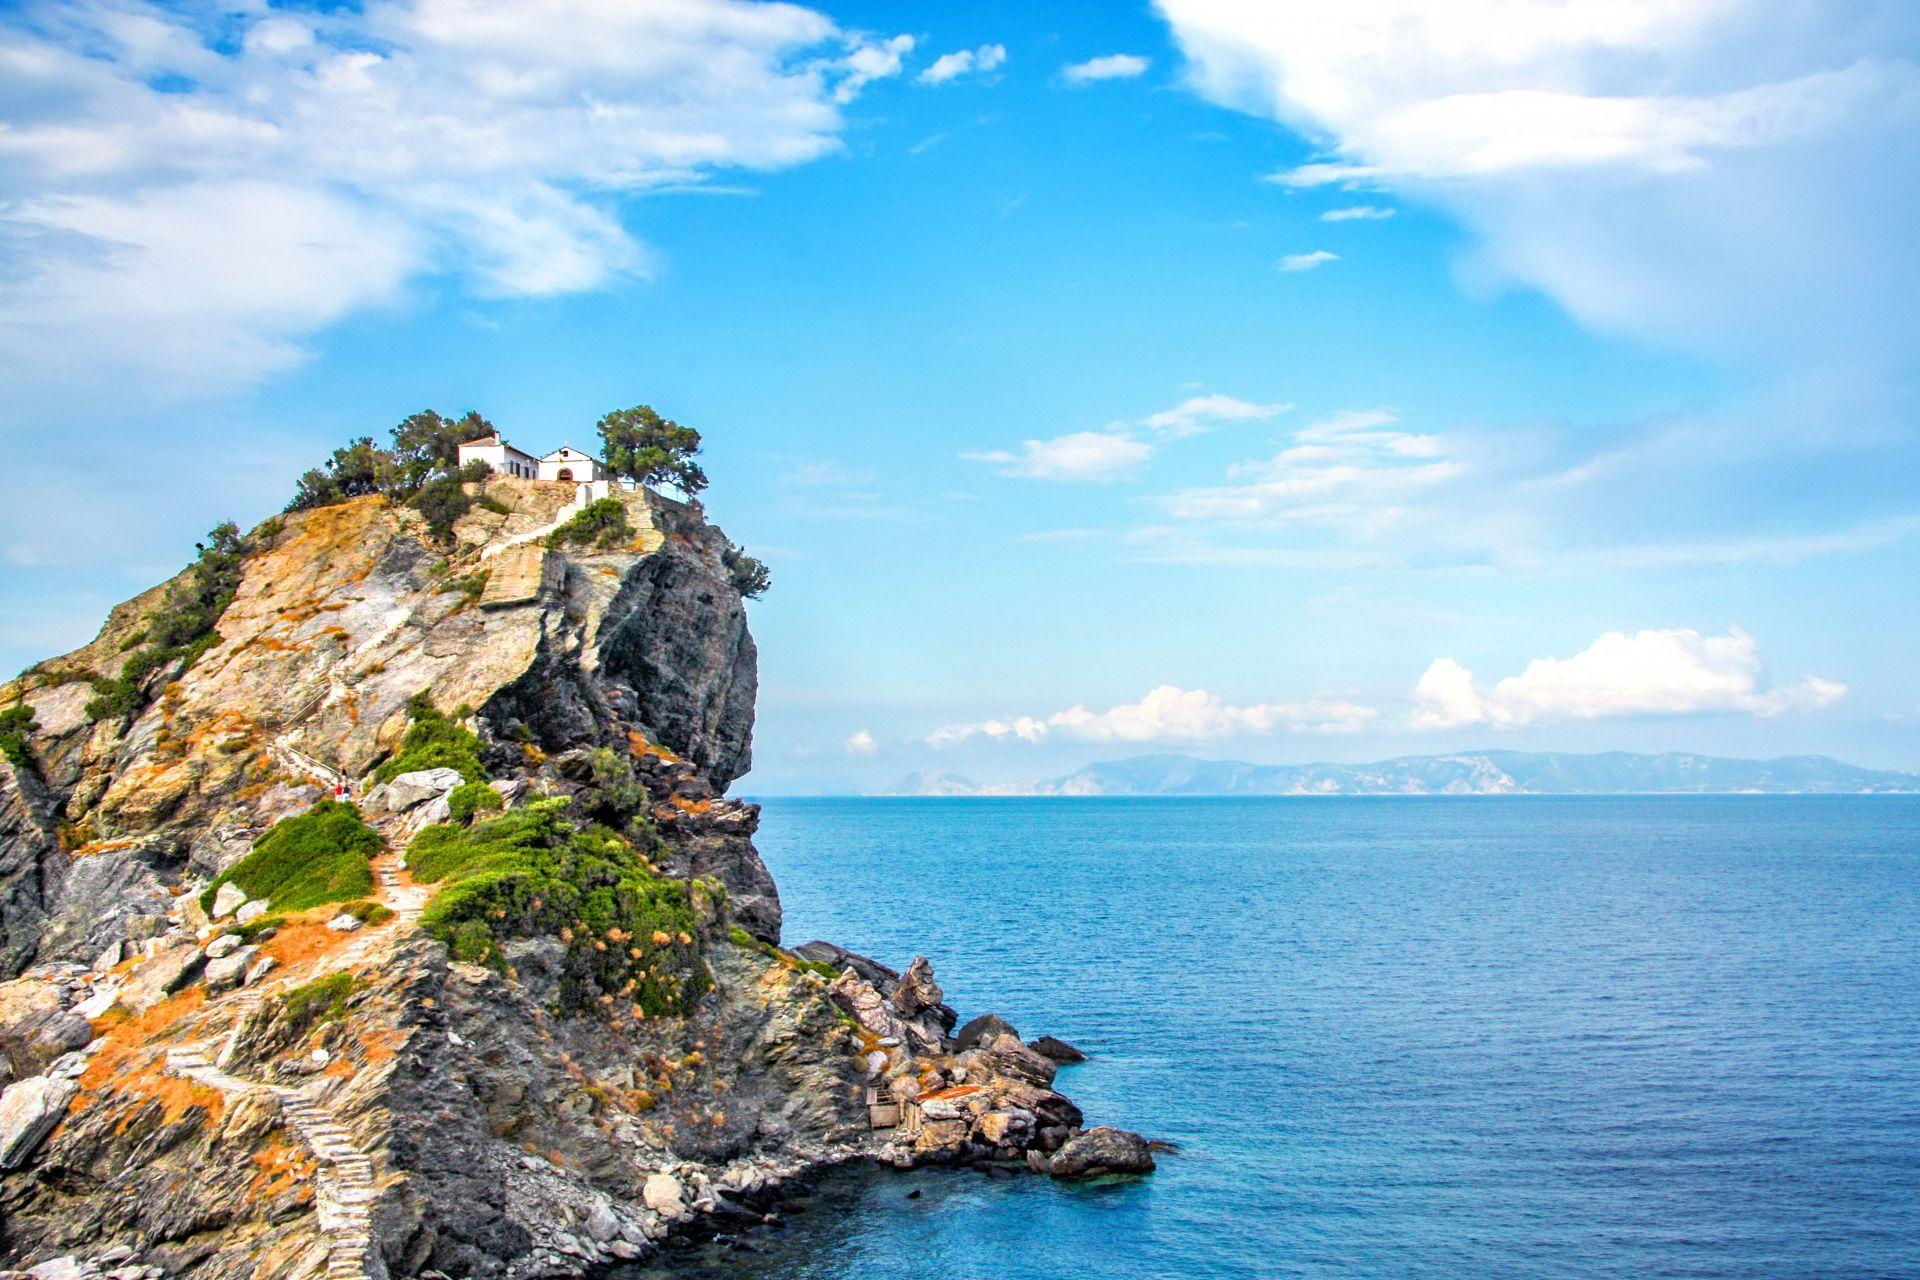 Skopelos island: Mamma mia